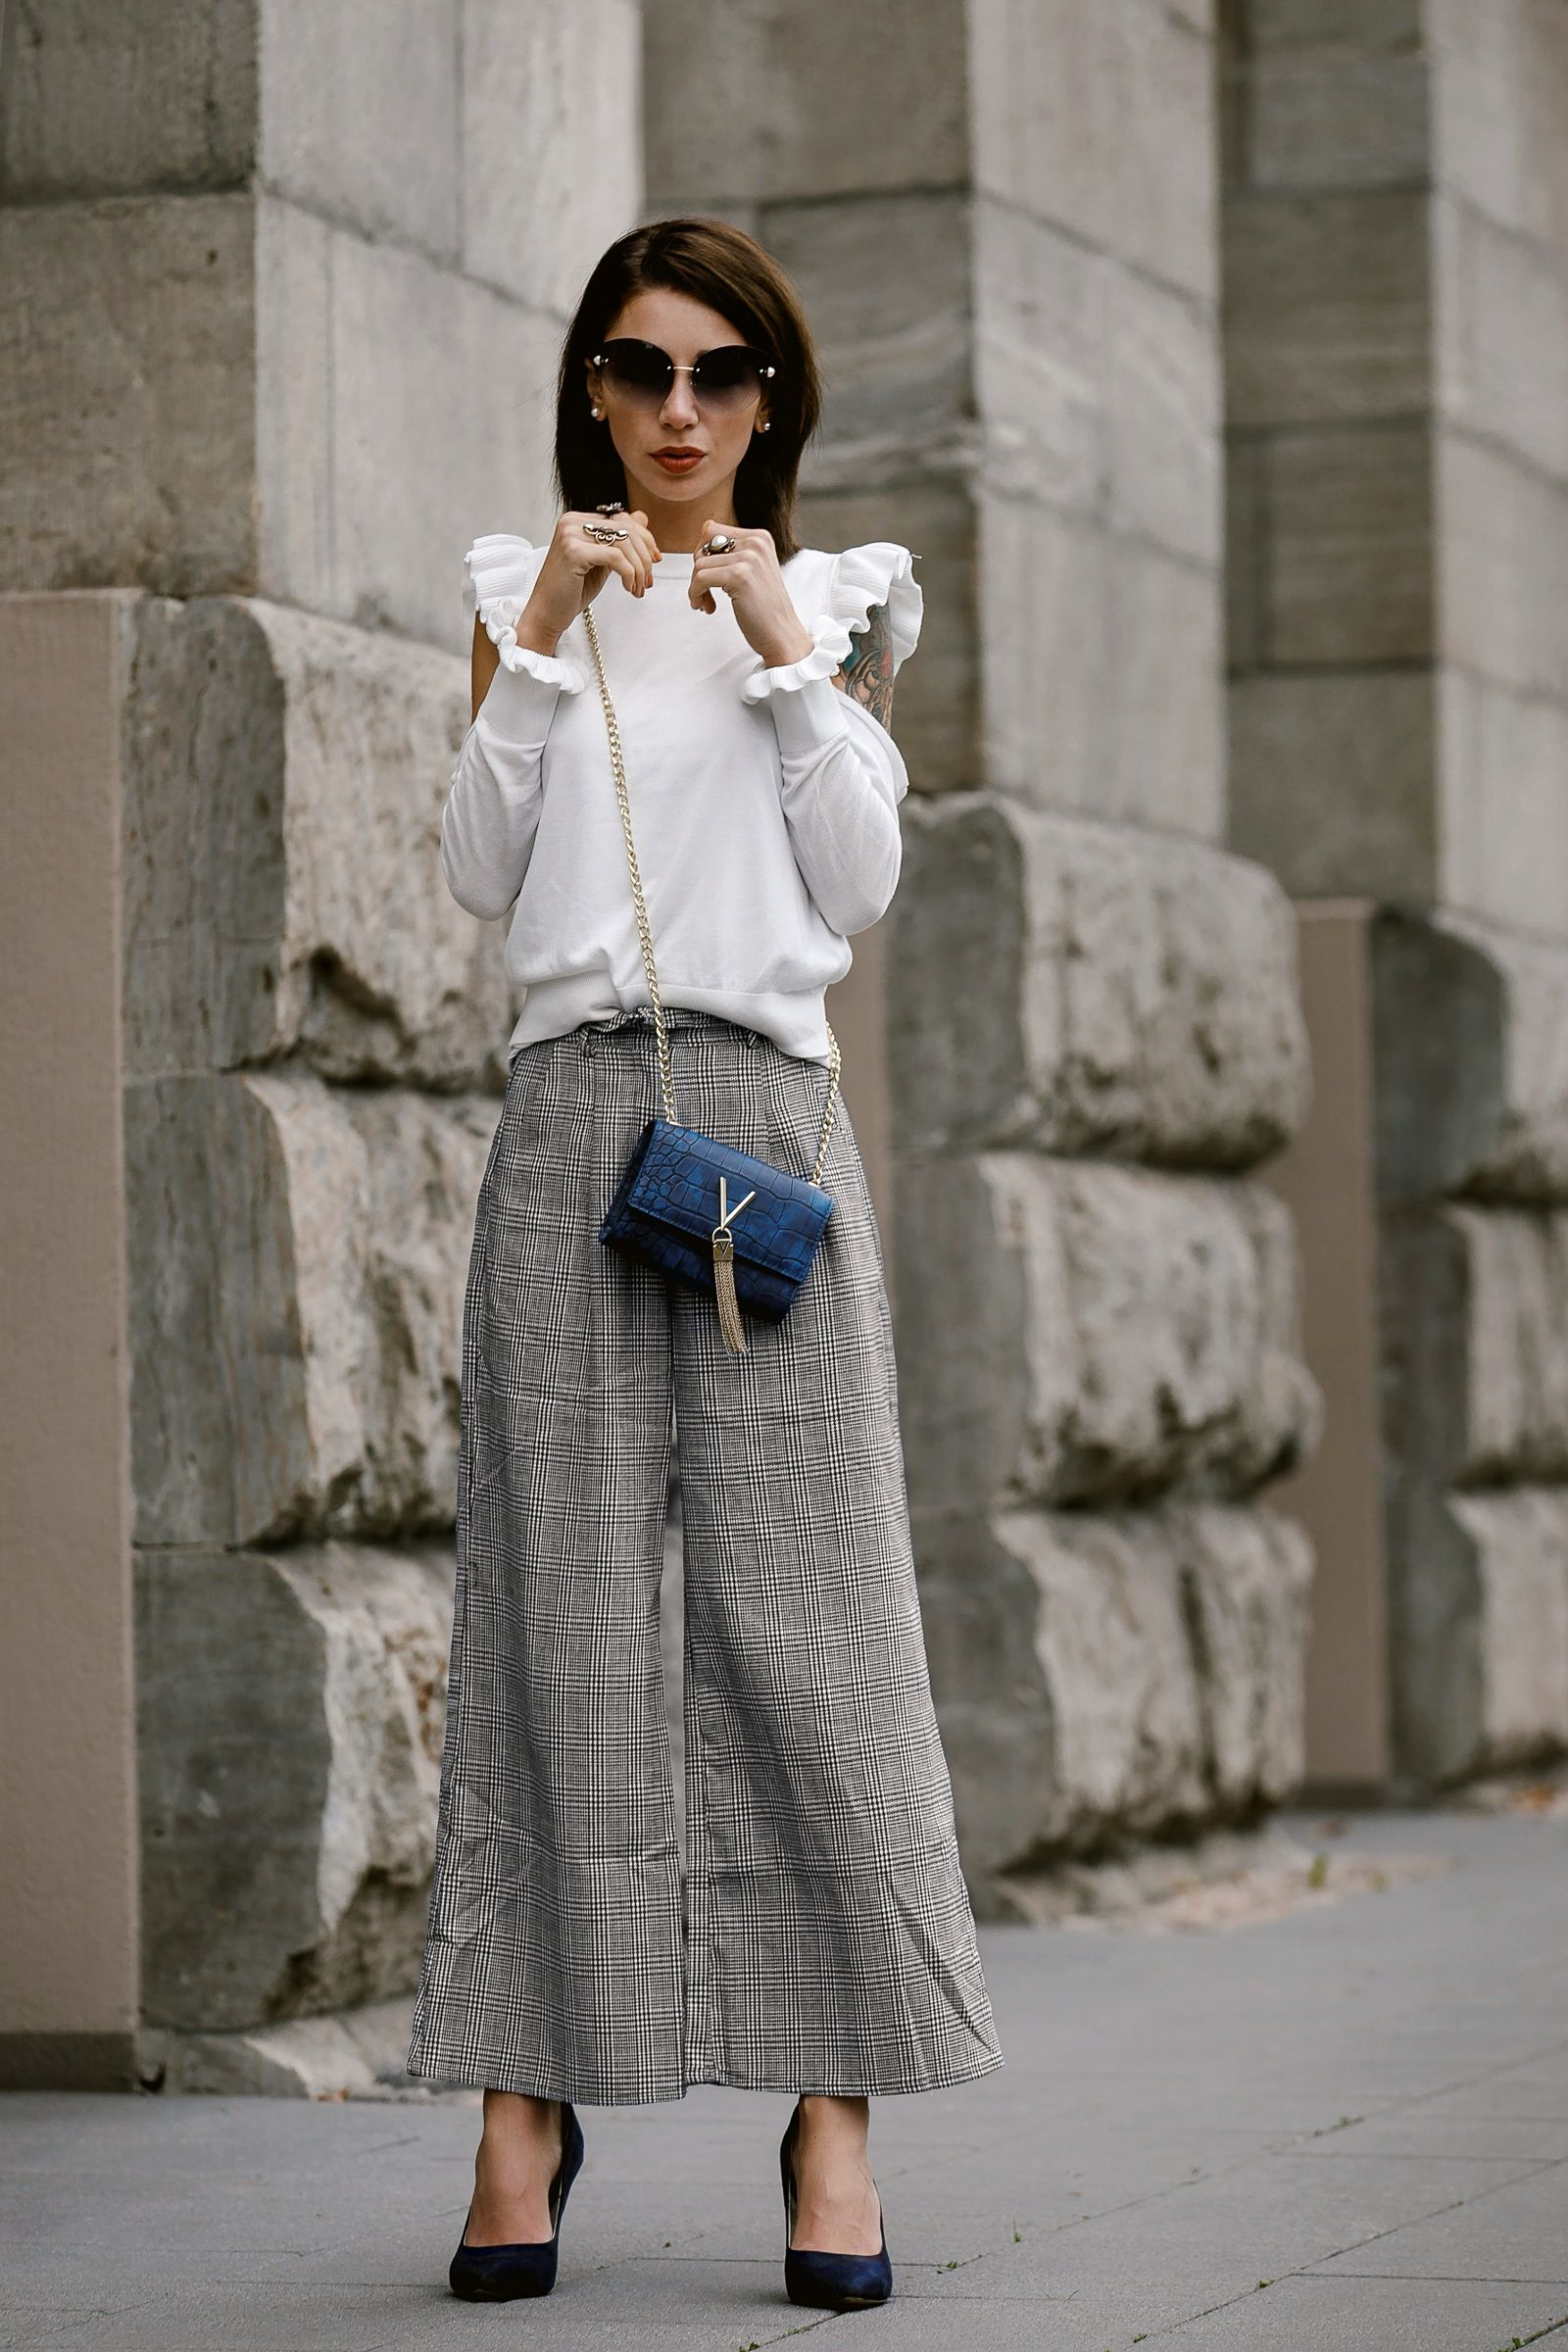 streetstyle outfit von mode bloggerin jasmin kessler hose mit glencheck muster mit cold shoulder - Glencheck Muster